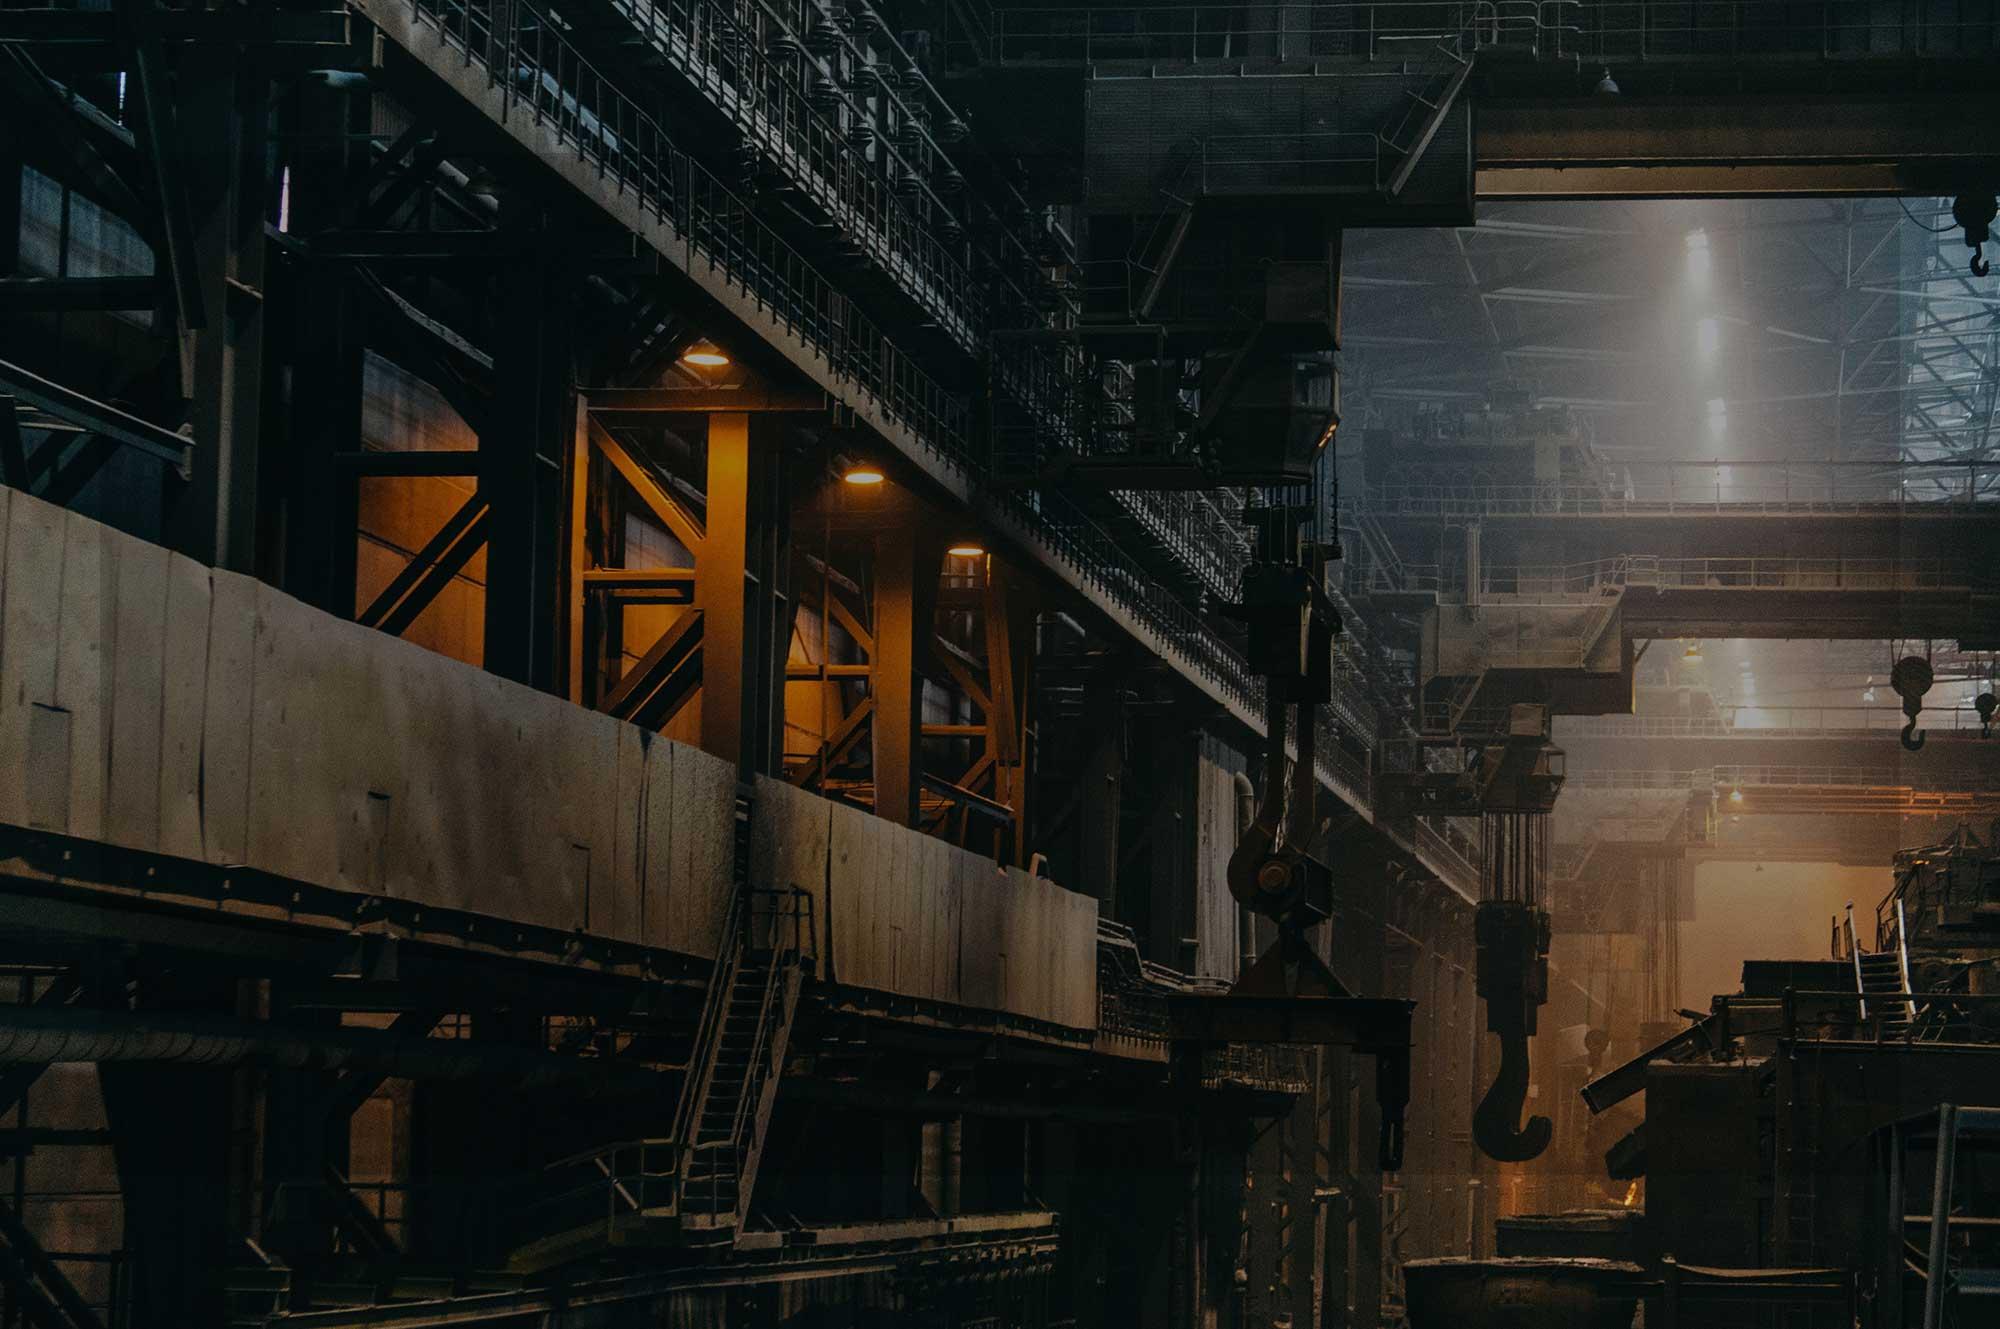 Rigging & Hardware Factory